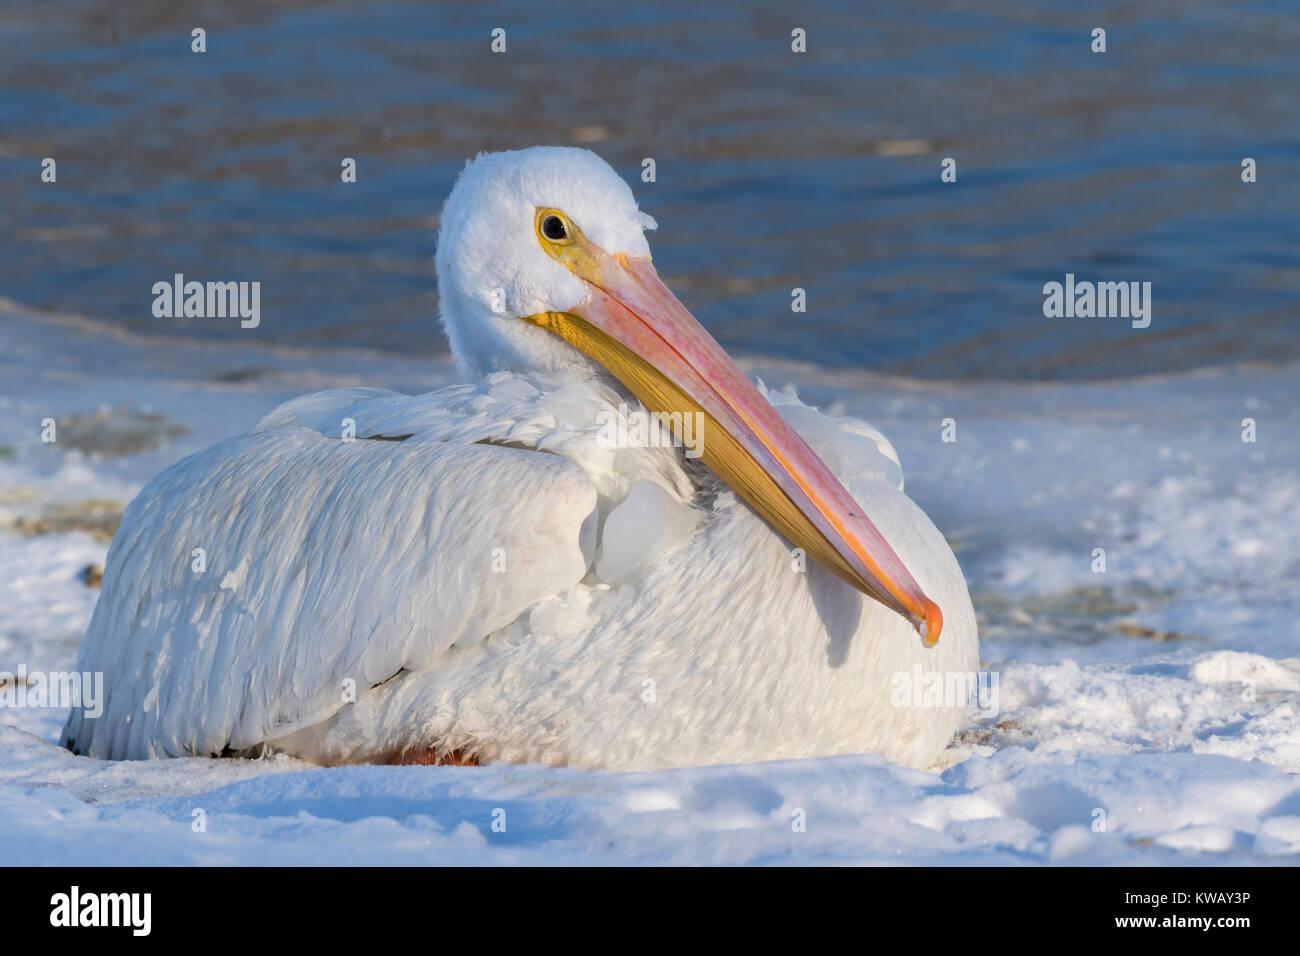 American white pelican (Pelecanus erythrorhynchos) on snow near the freezing lake, Saylorville Lake, iowa, USA - Stock Image